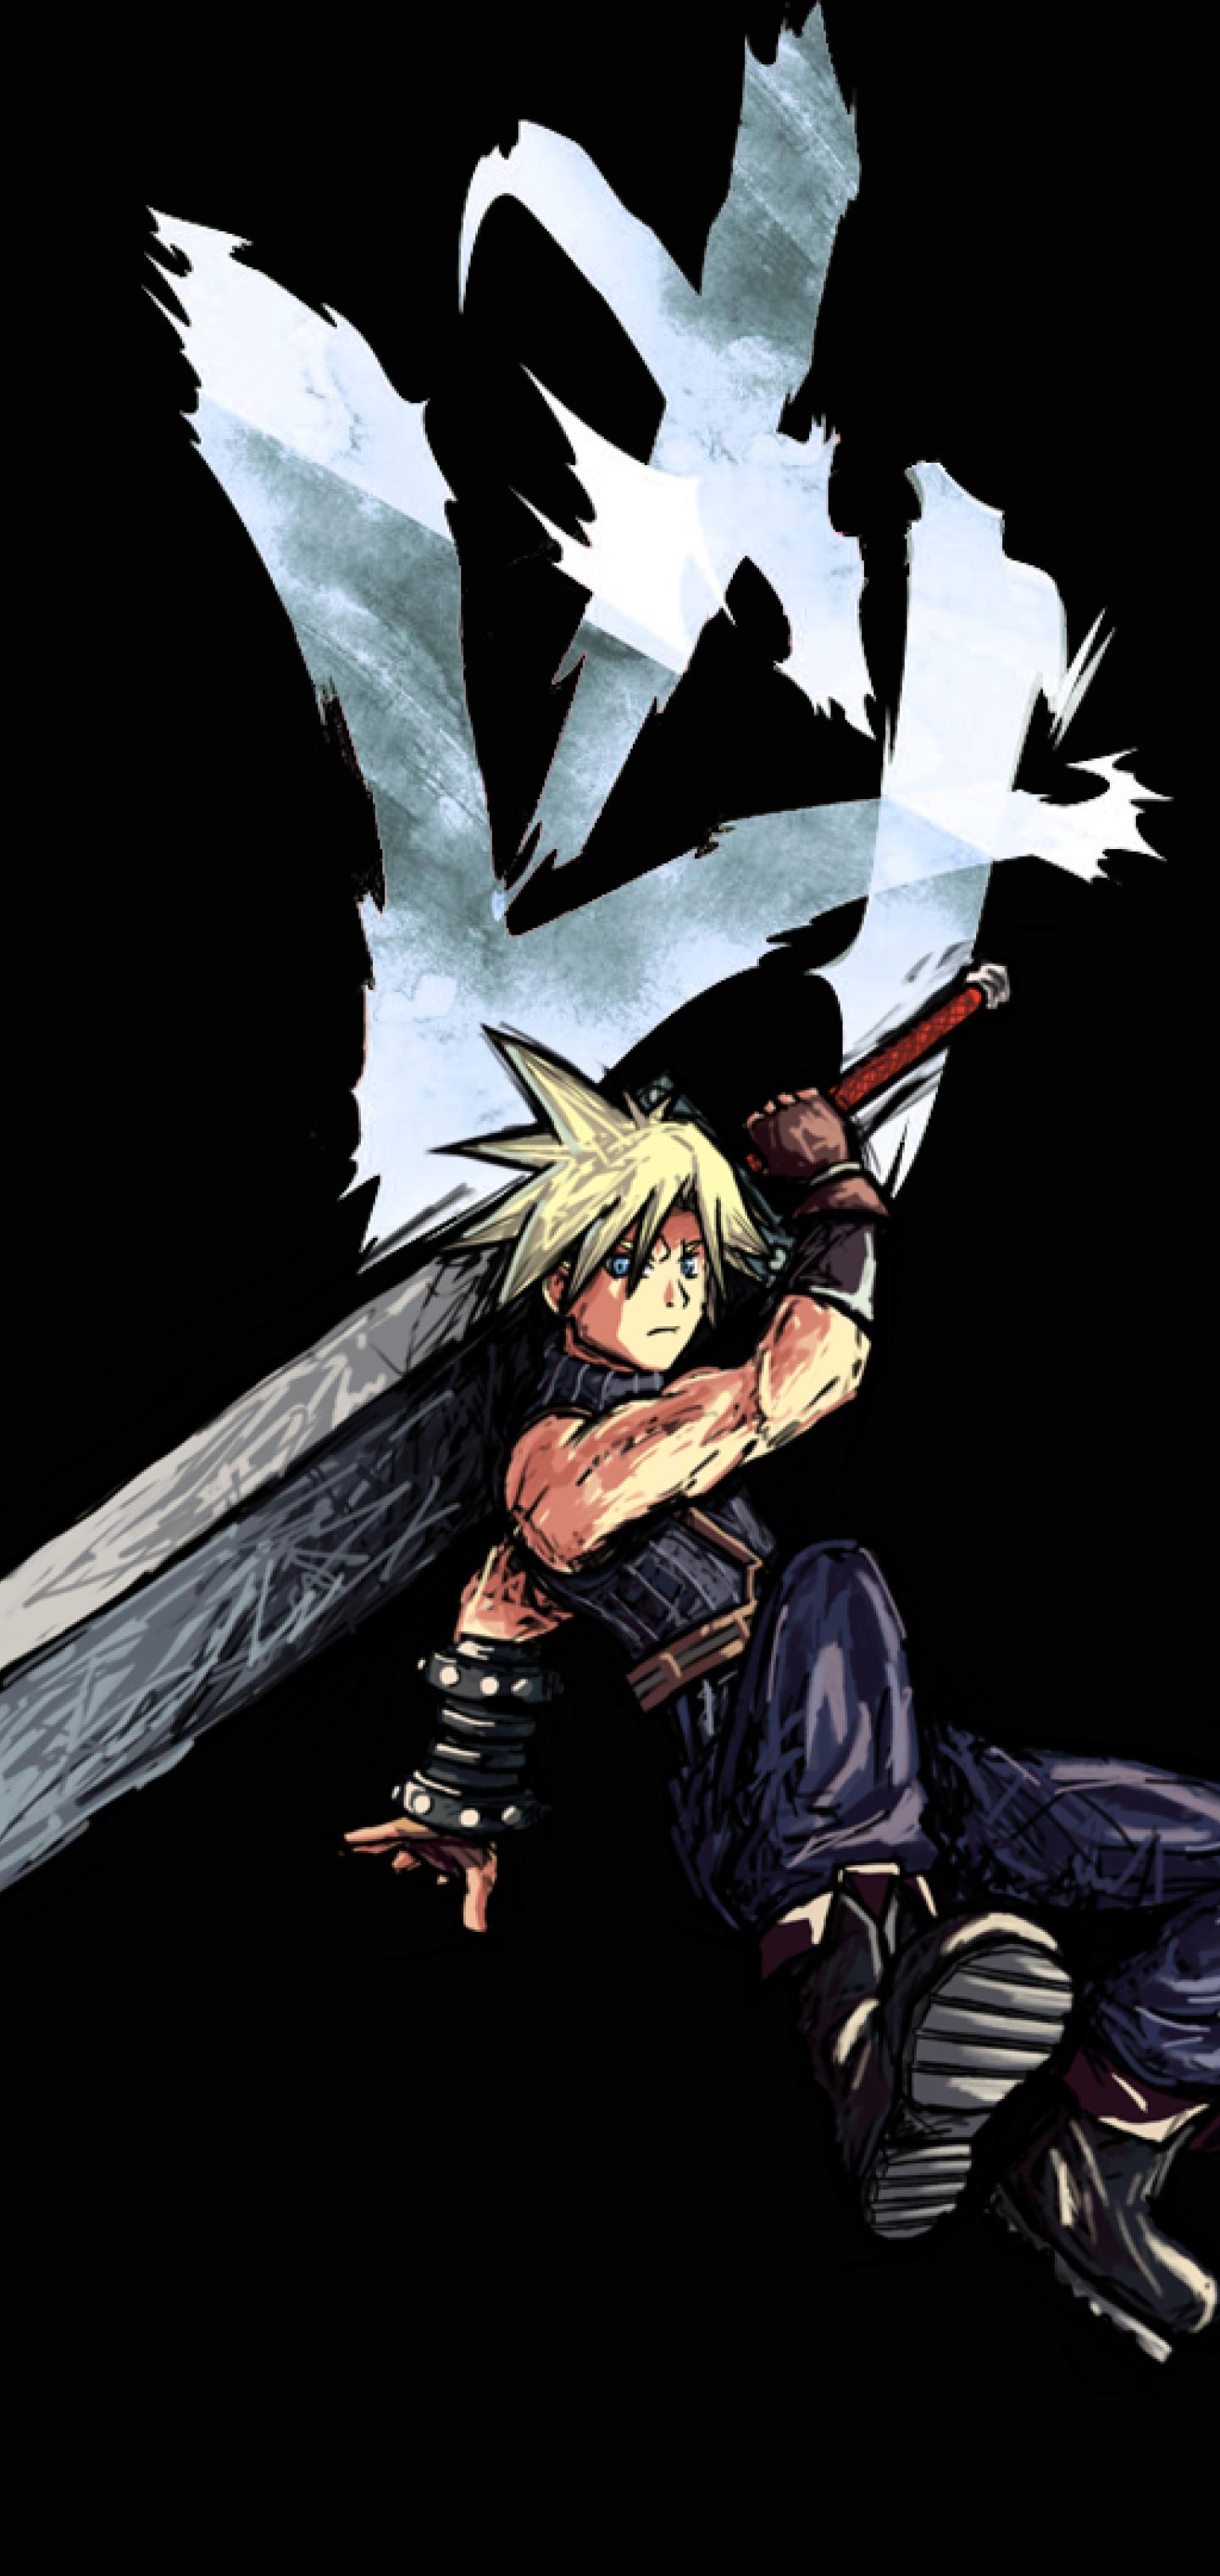 1440x3040 Cloud Strife Final Fantasy 1440x3040 Resolution